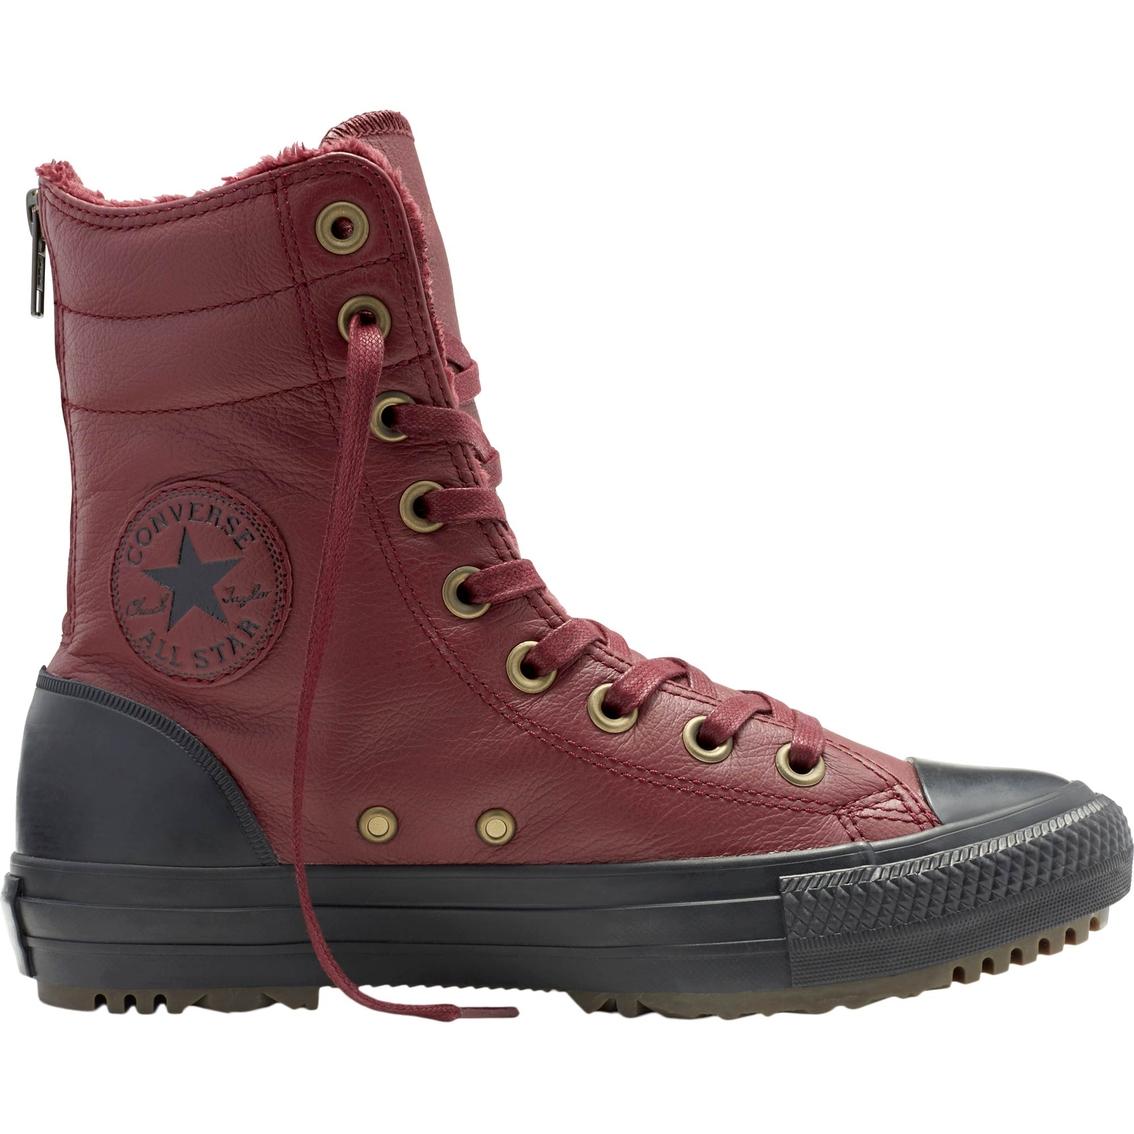 Converse Chuck Taylor All Star Hi Rise Sneaker Boot X Hi ...